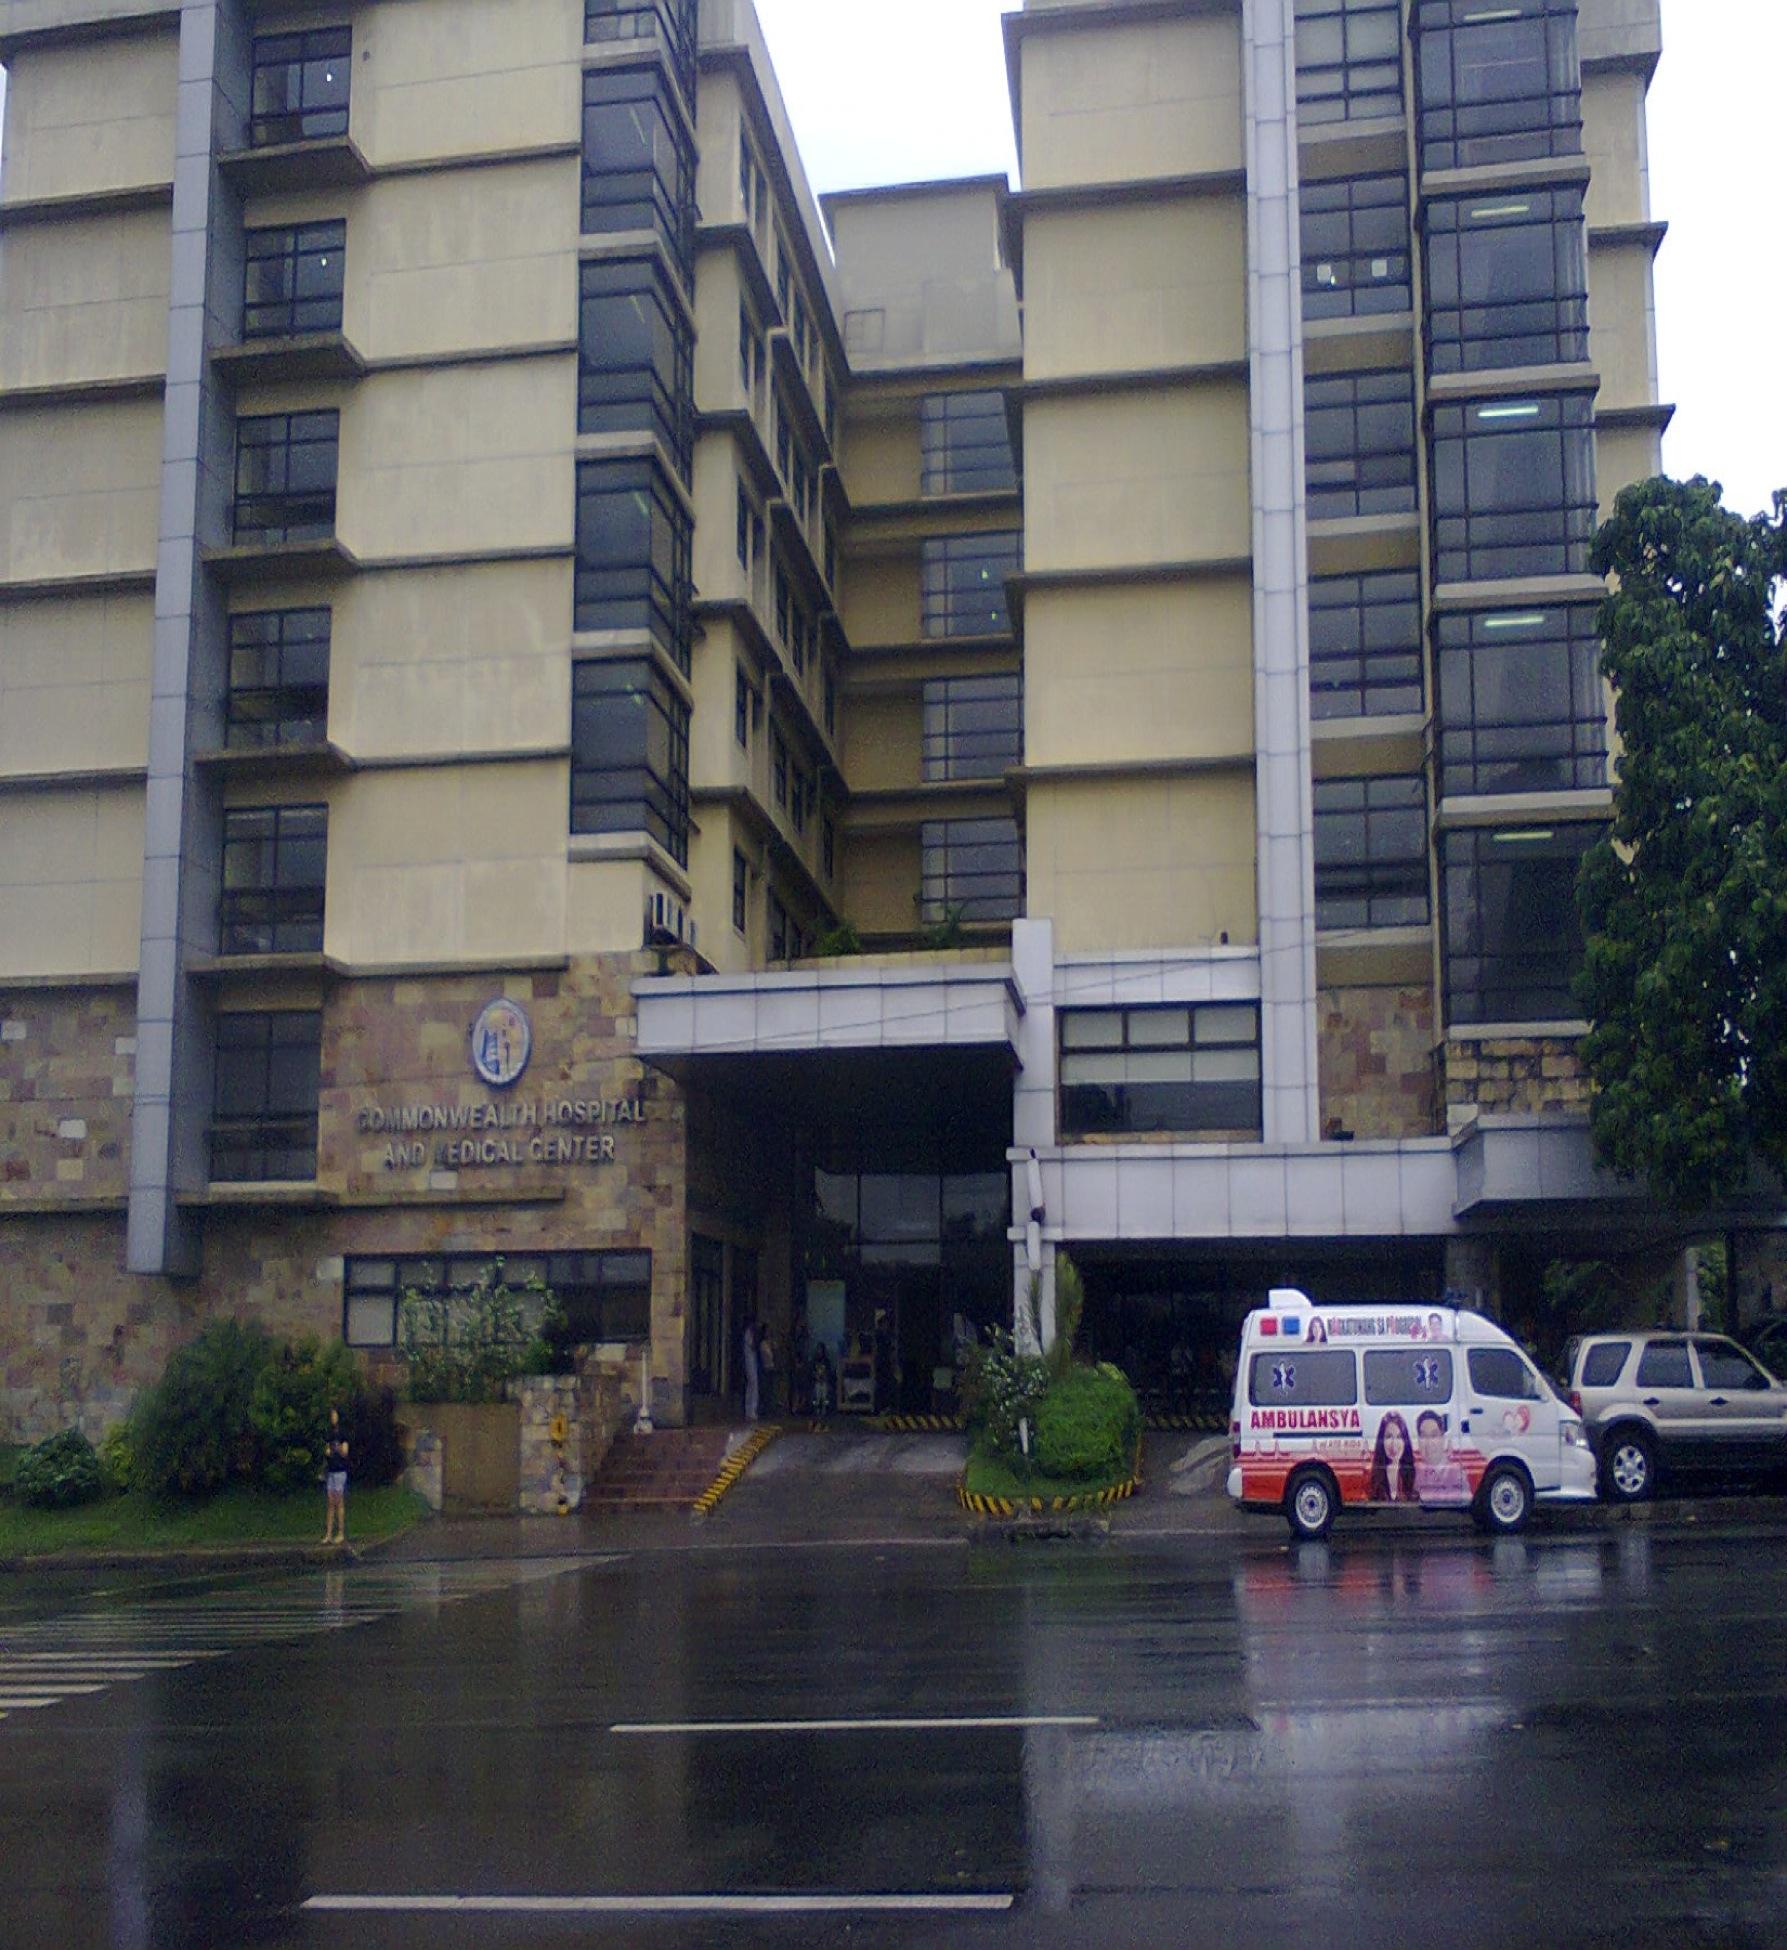 Commonwealth Hospital